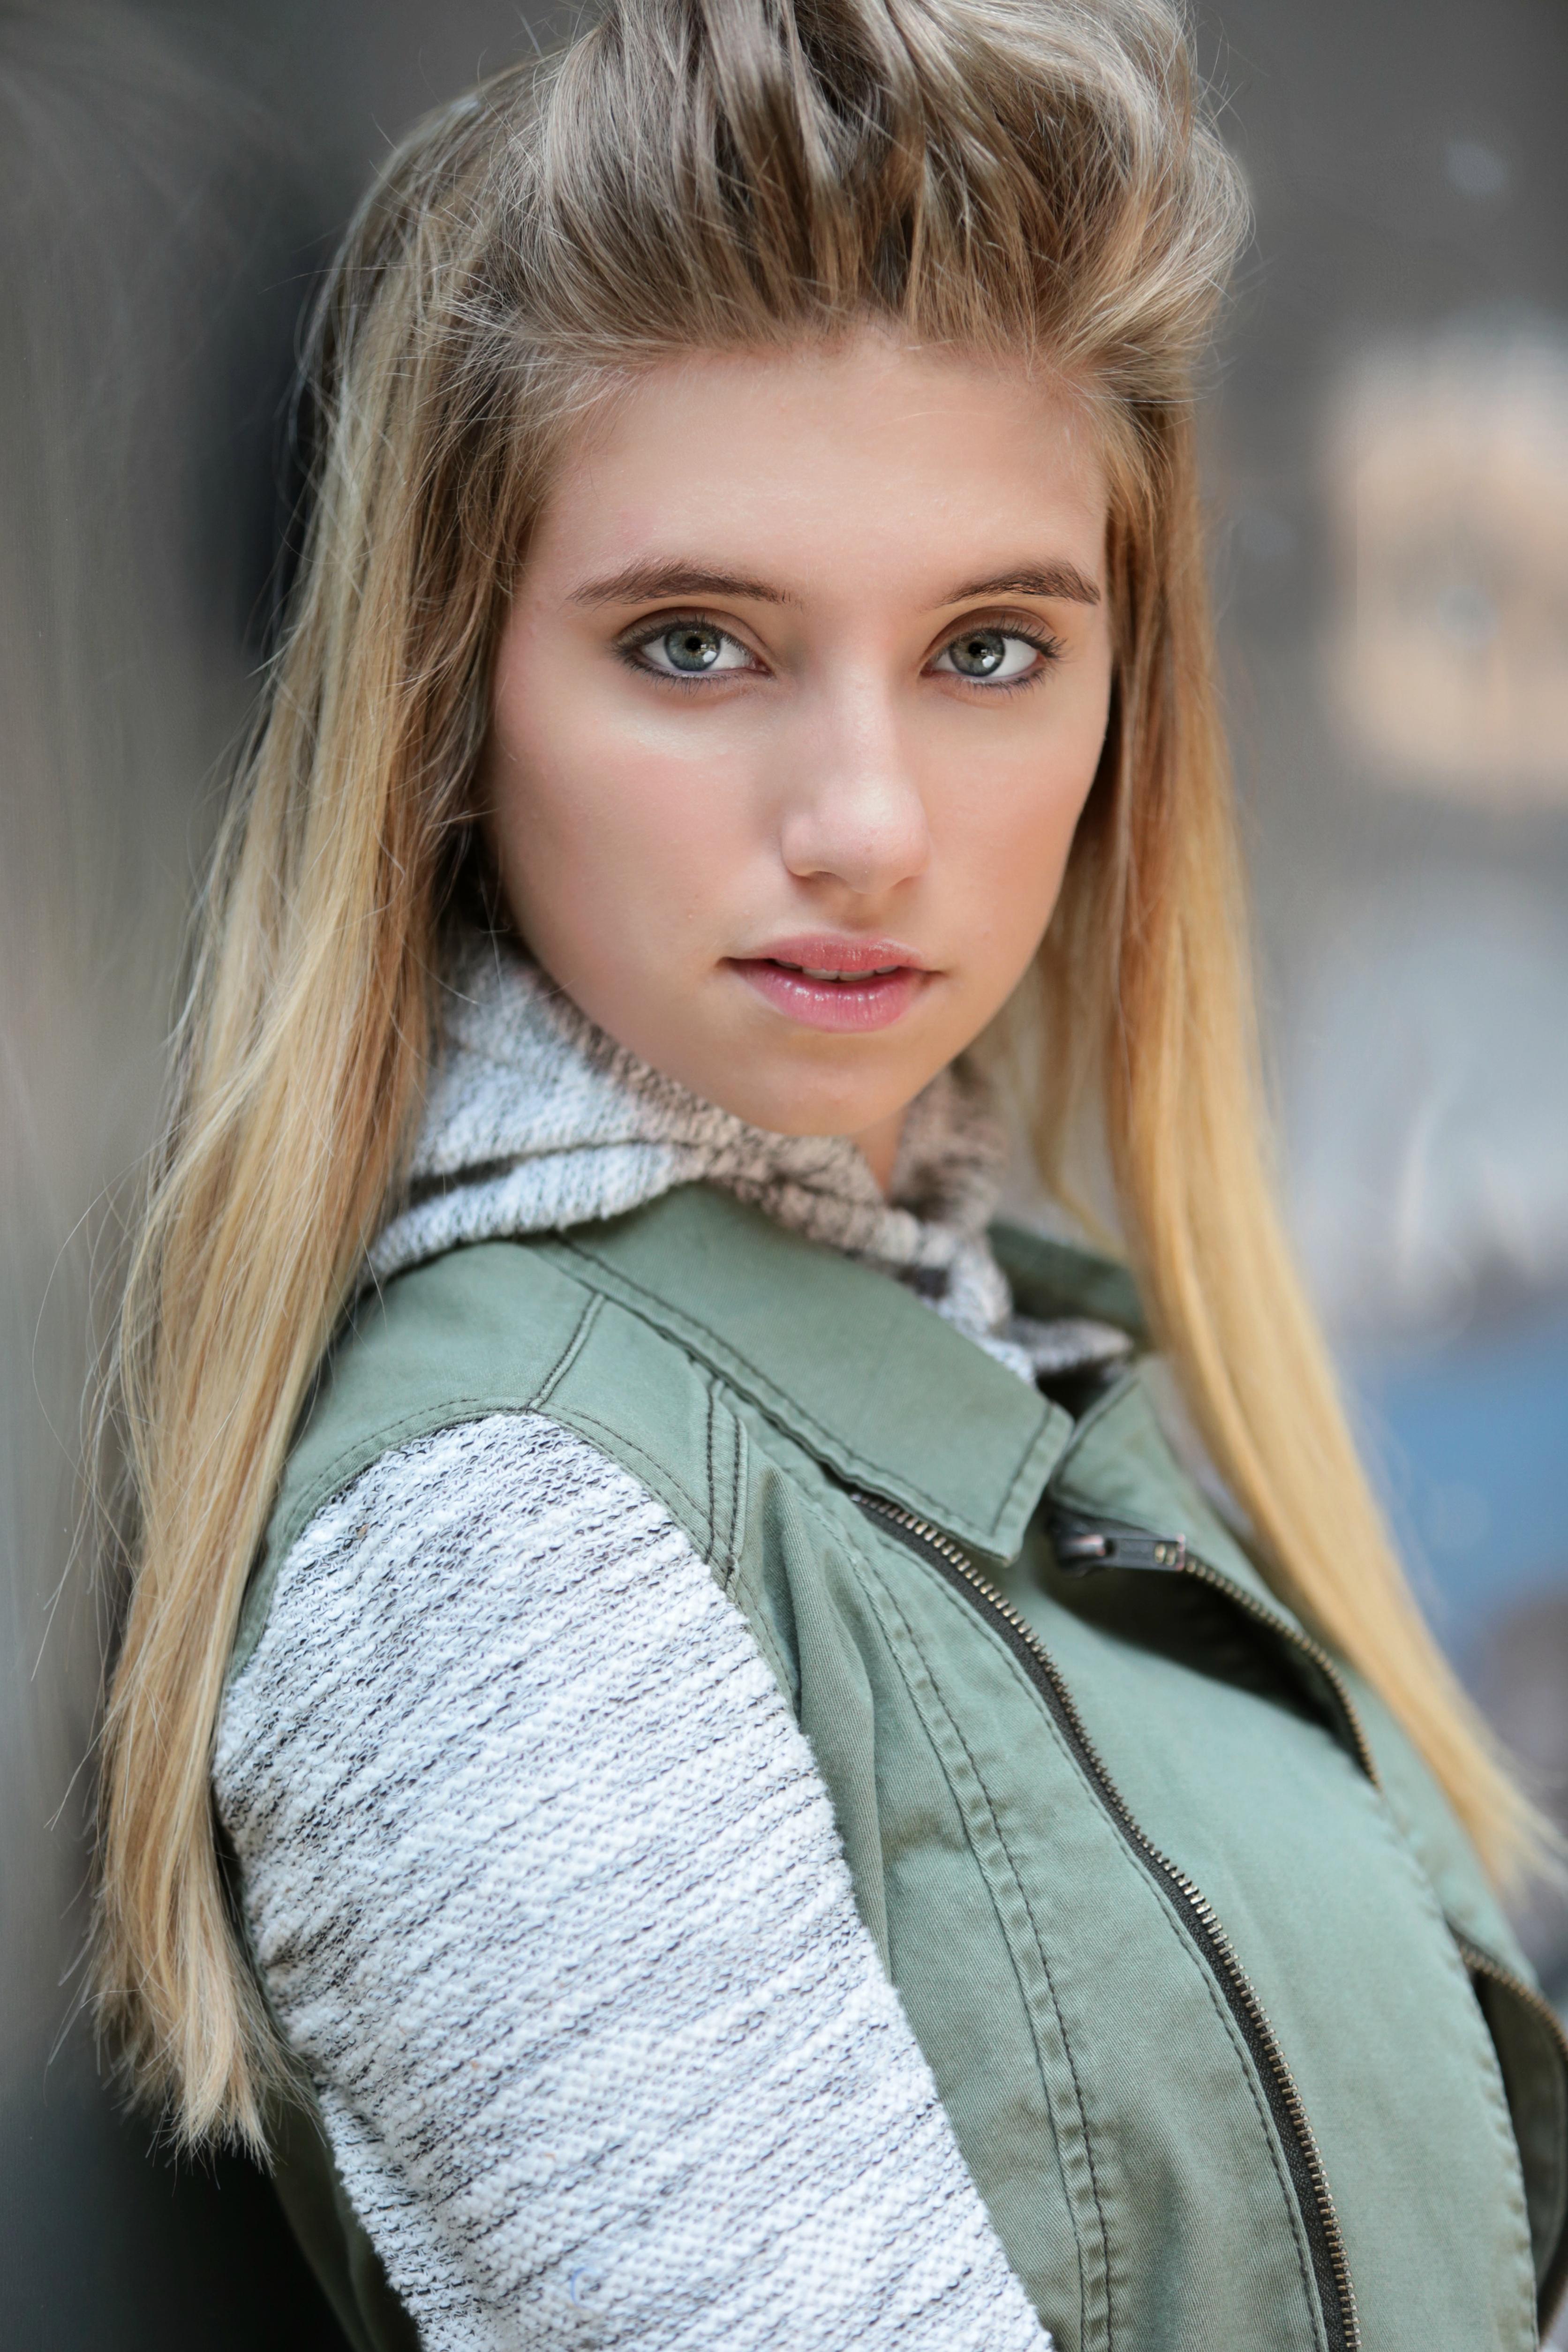 Sophie Bolen